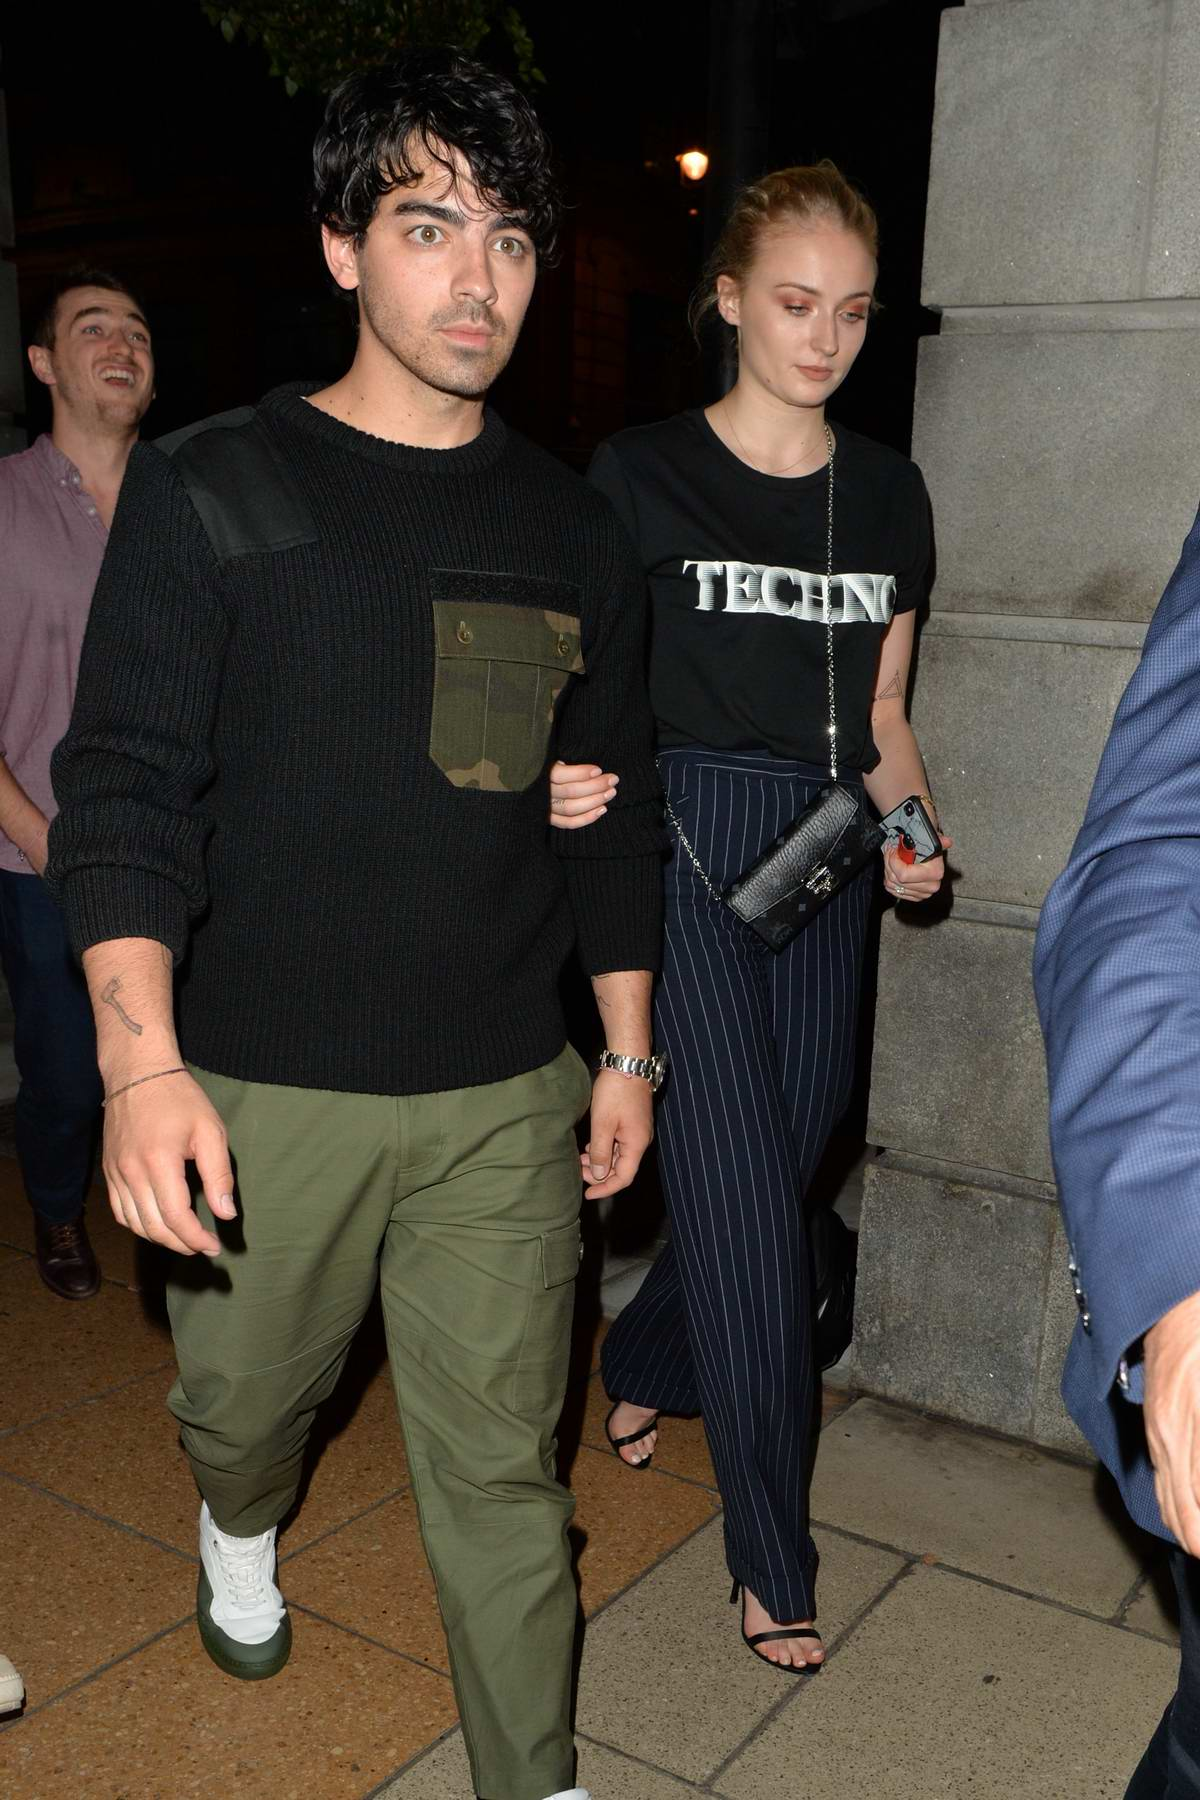 Sophie Turner and Joe Jonas leaves after dinner at 34 Restaurant in Mayfair, London, UK